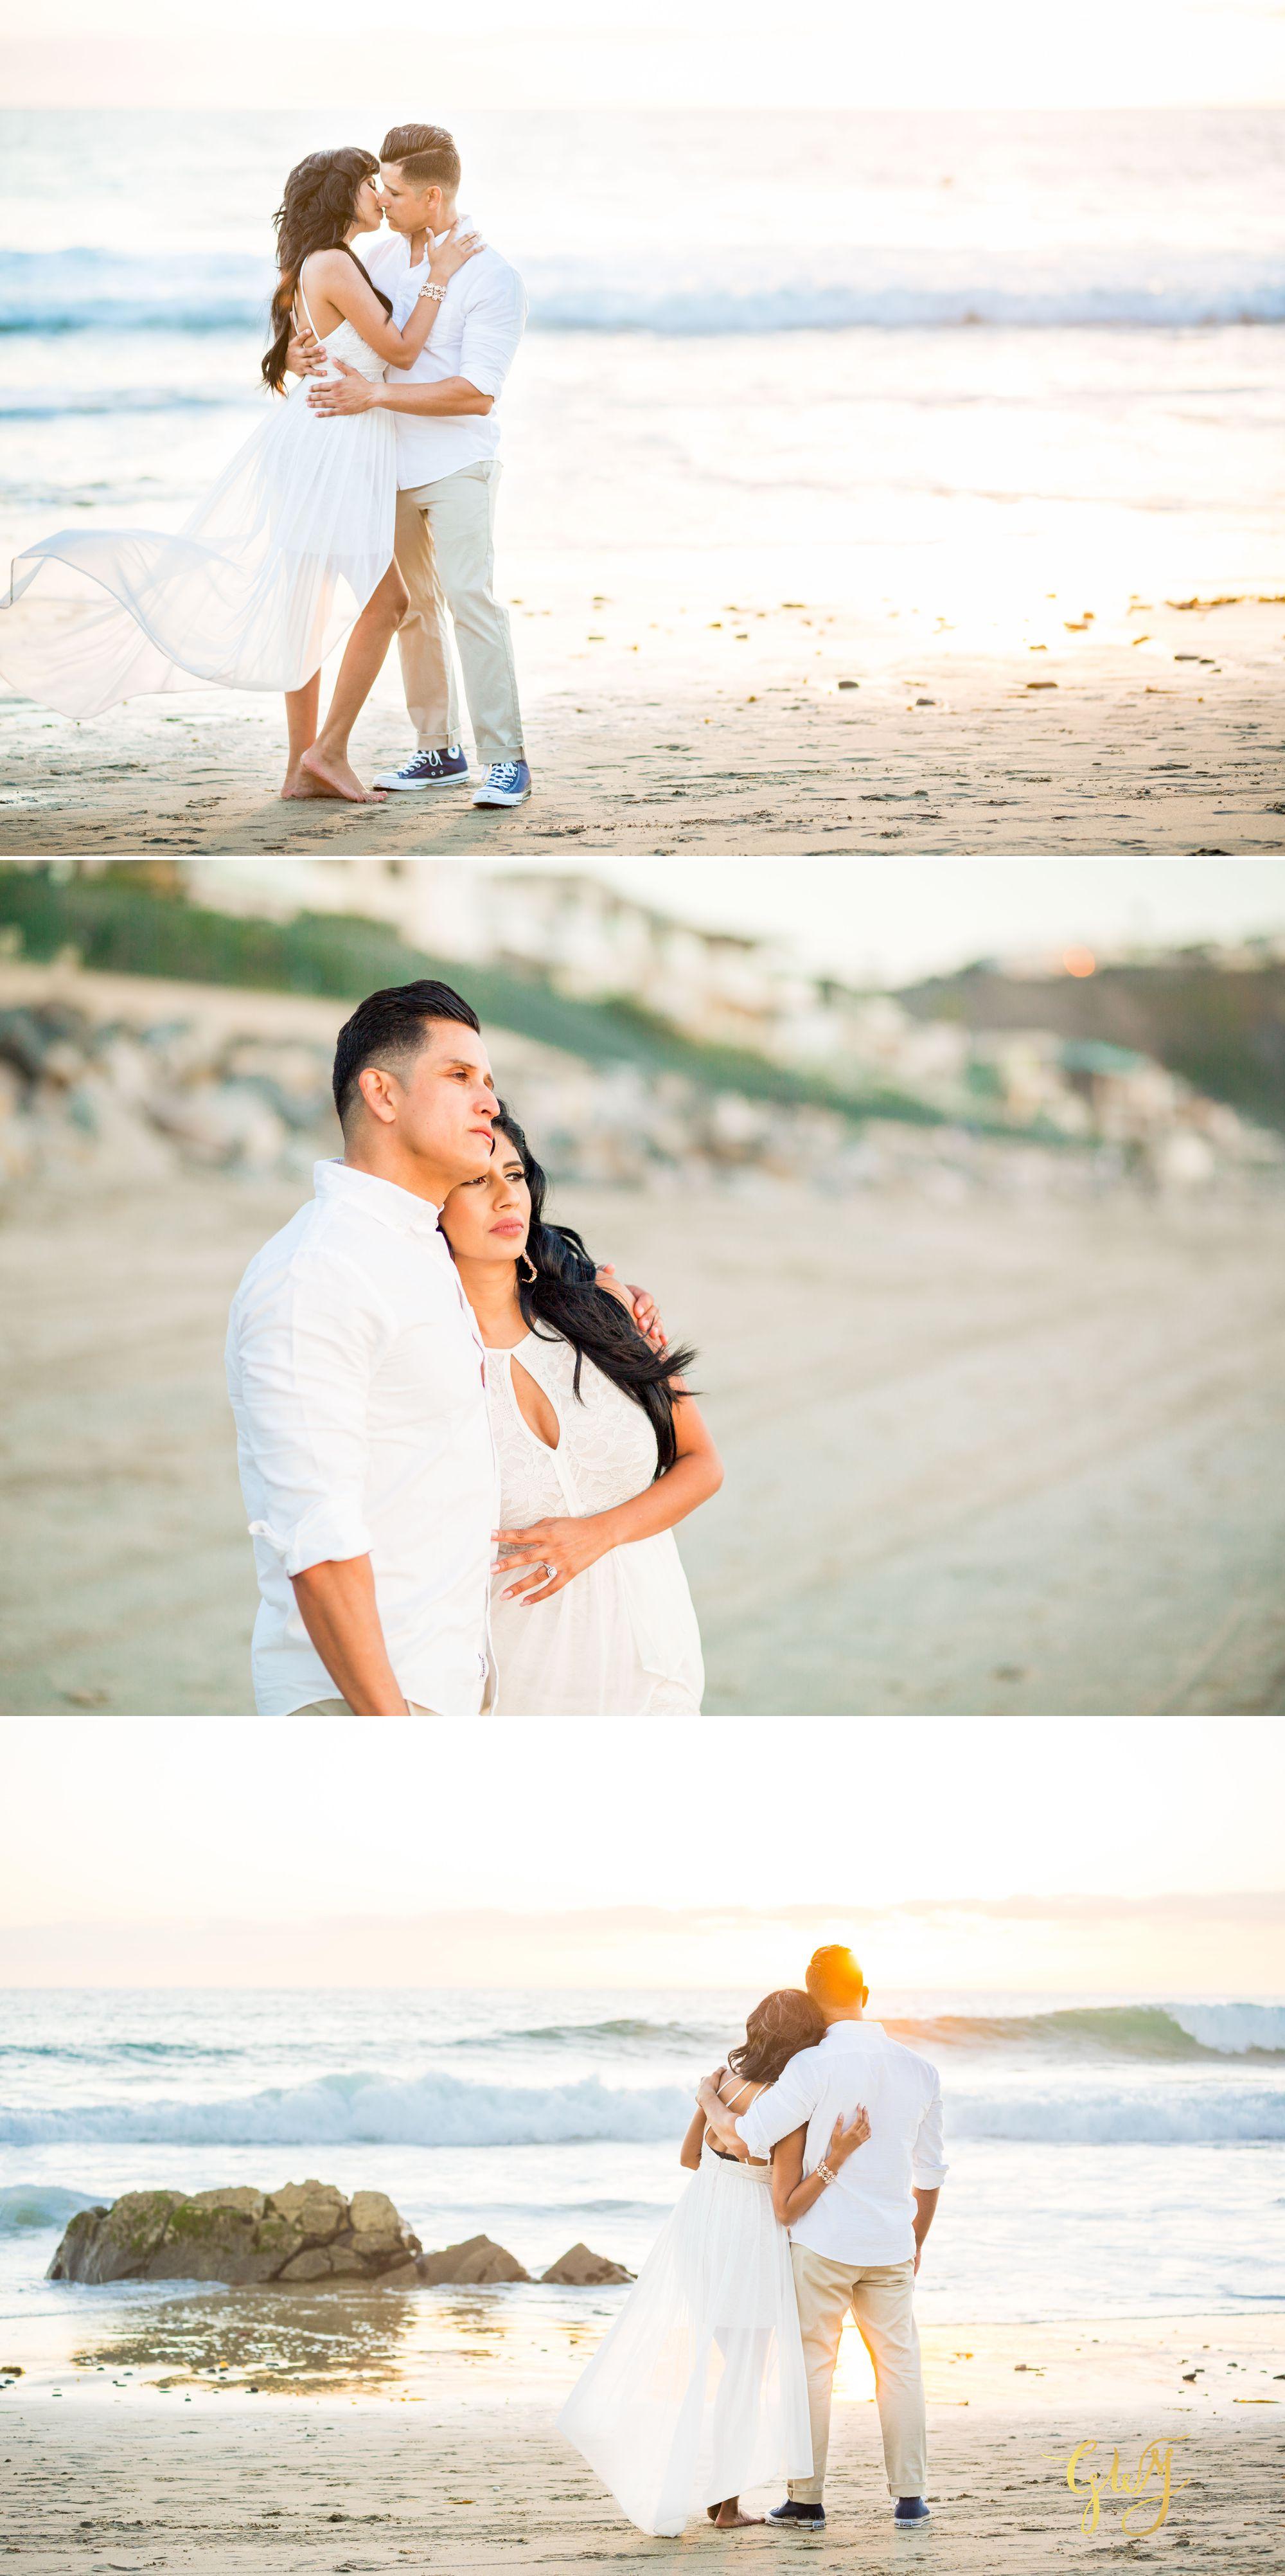 Angela + Drew Mission San Juan Capistrano Strands Beach Sunset Engagement 15.jpg